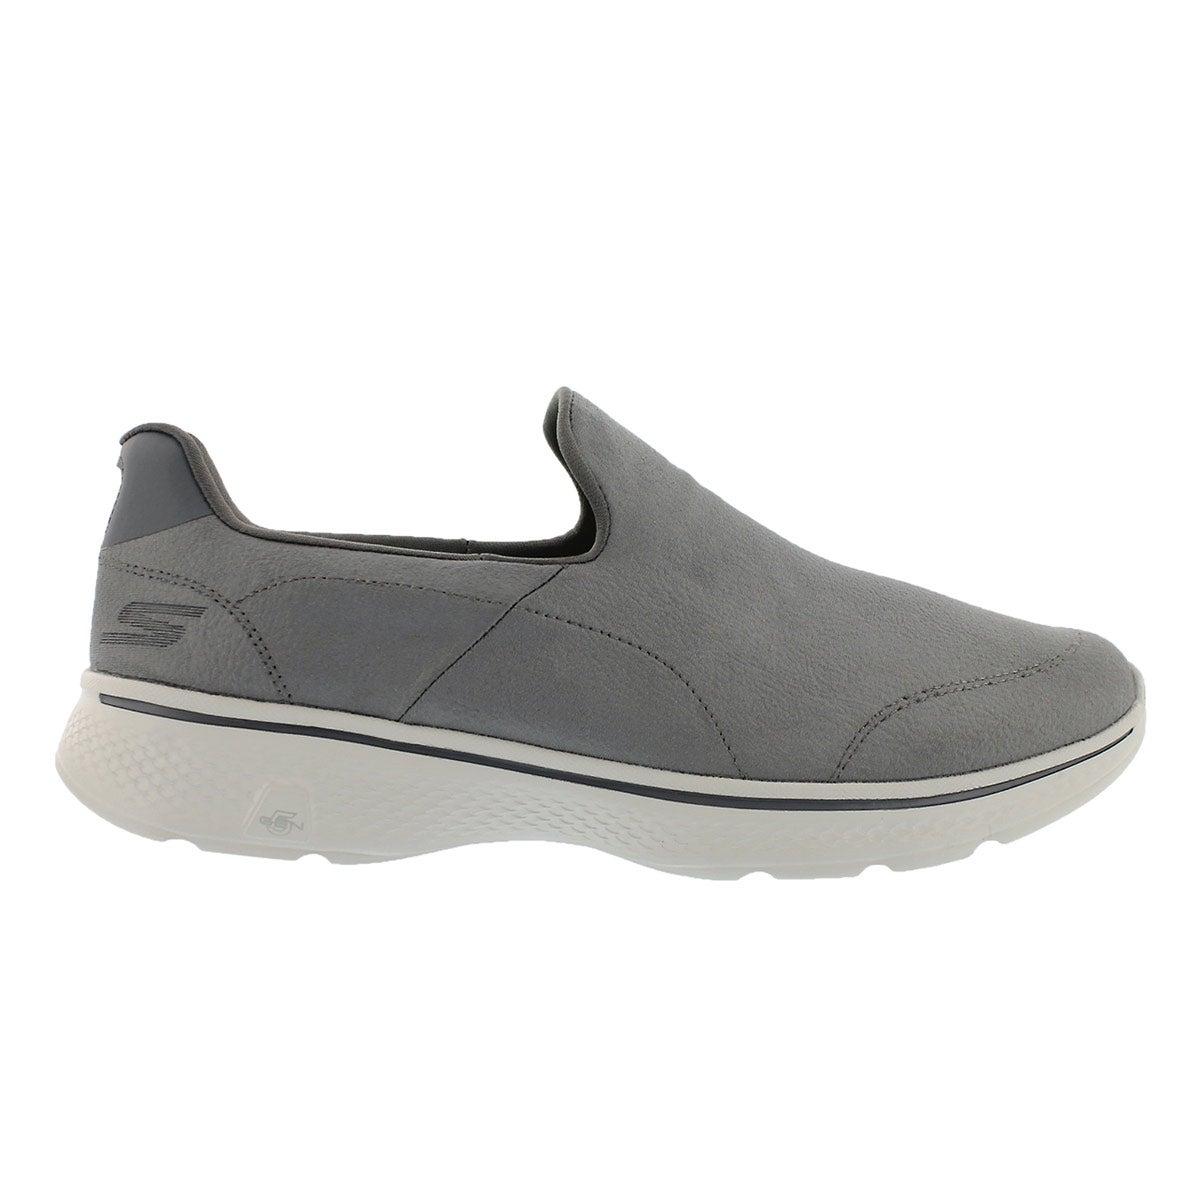 Mns GOwalk4 Remarkable char slip on shoe